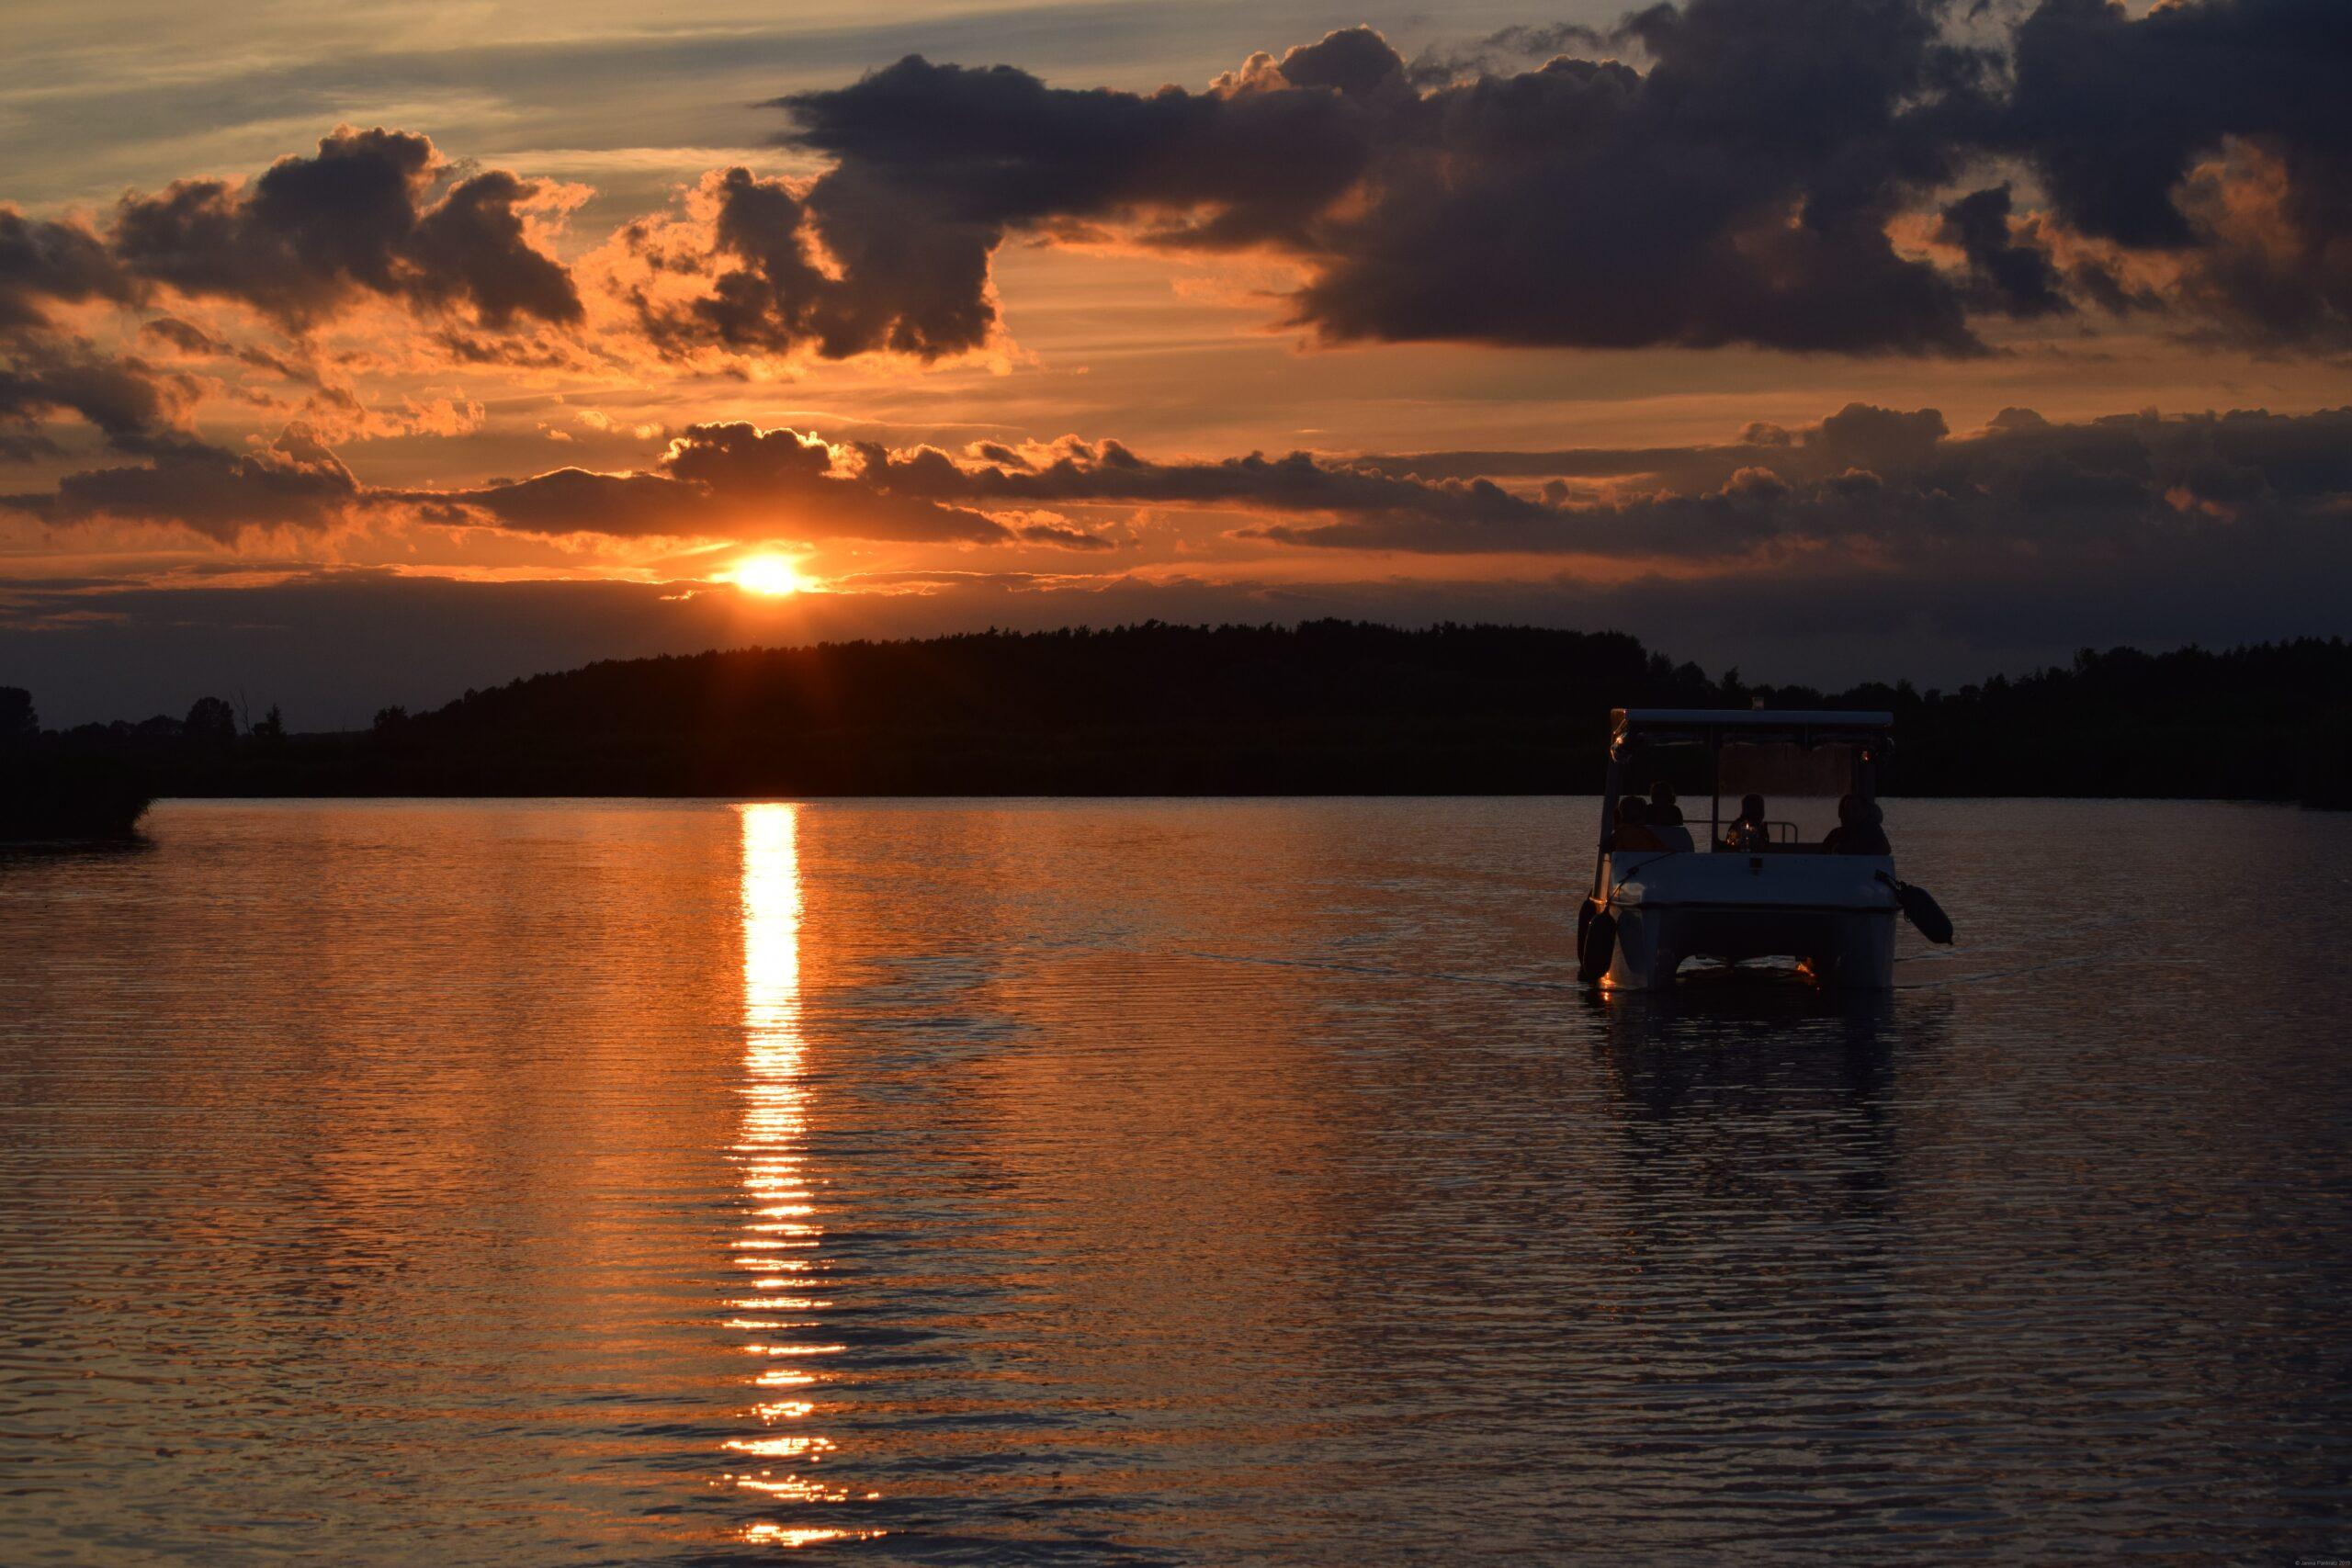 Solarboot auf der Peene im Sonnenuntergang, Simon Reuter